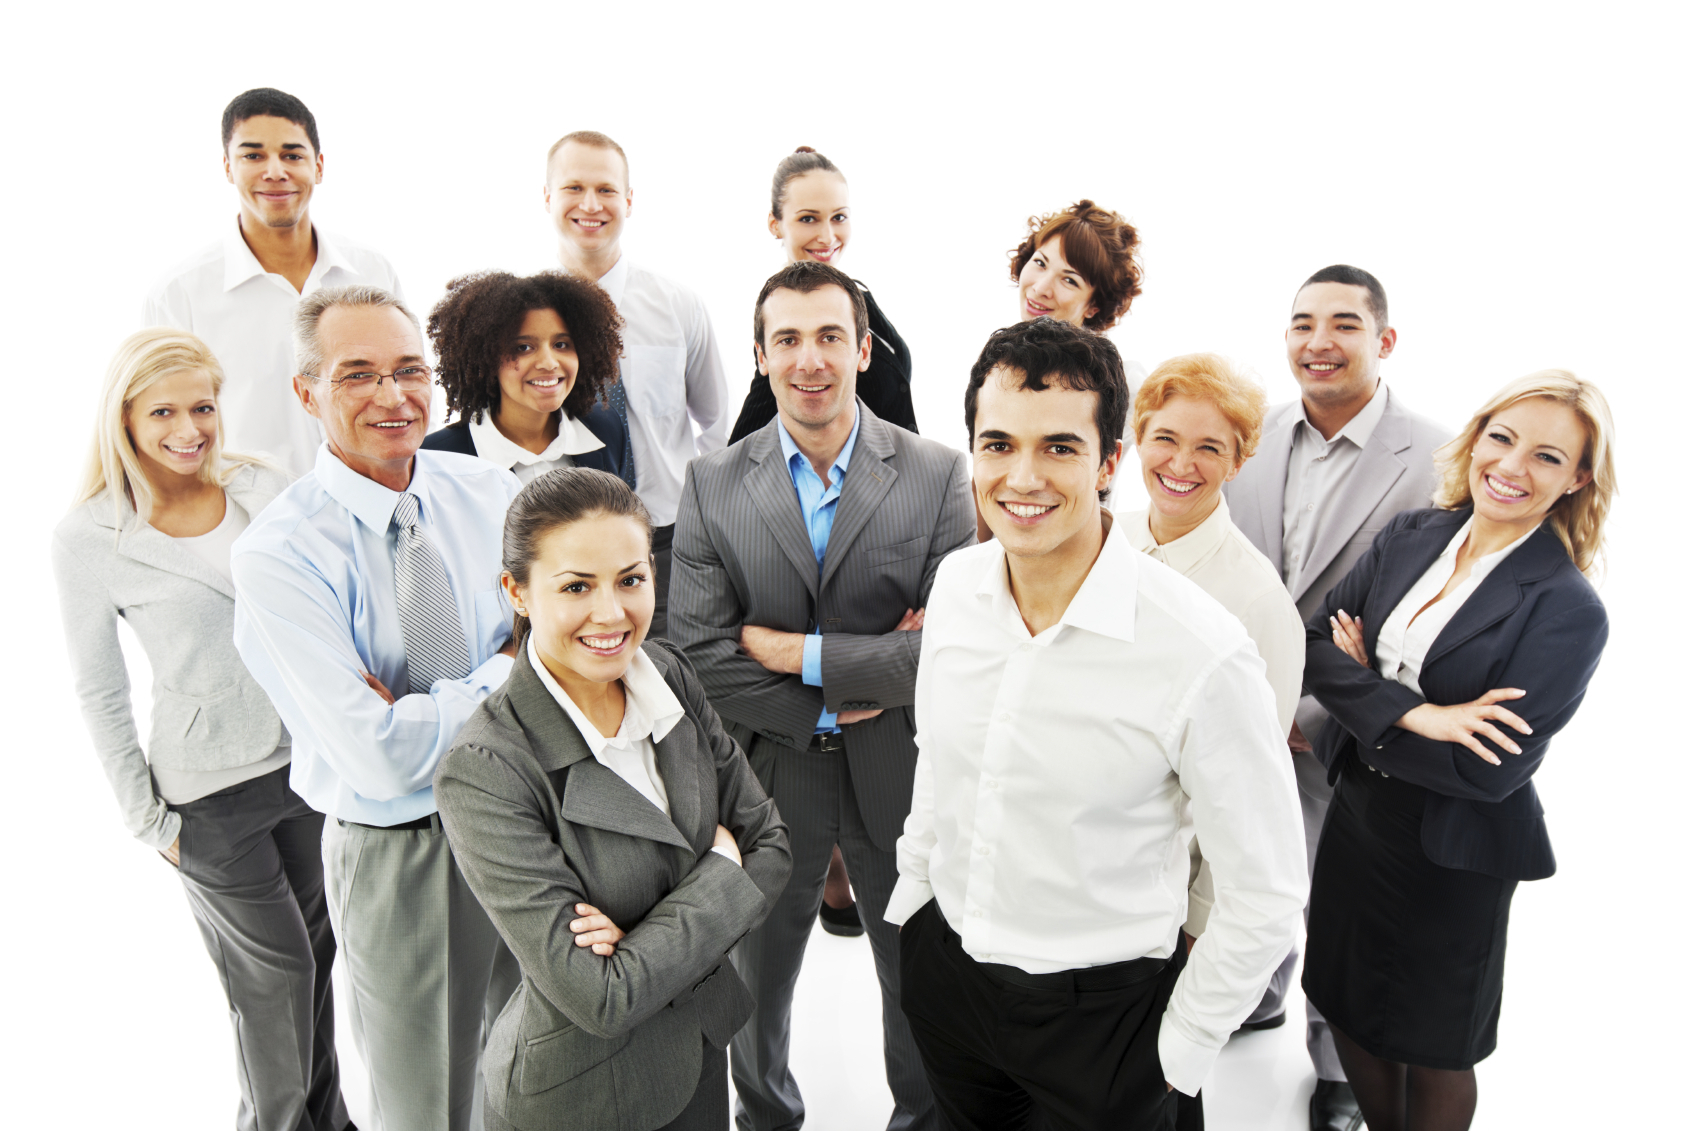 Meet, Network, & Learn - Professional Meetings - Jackson's ALL WELLness  Services, LLC